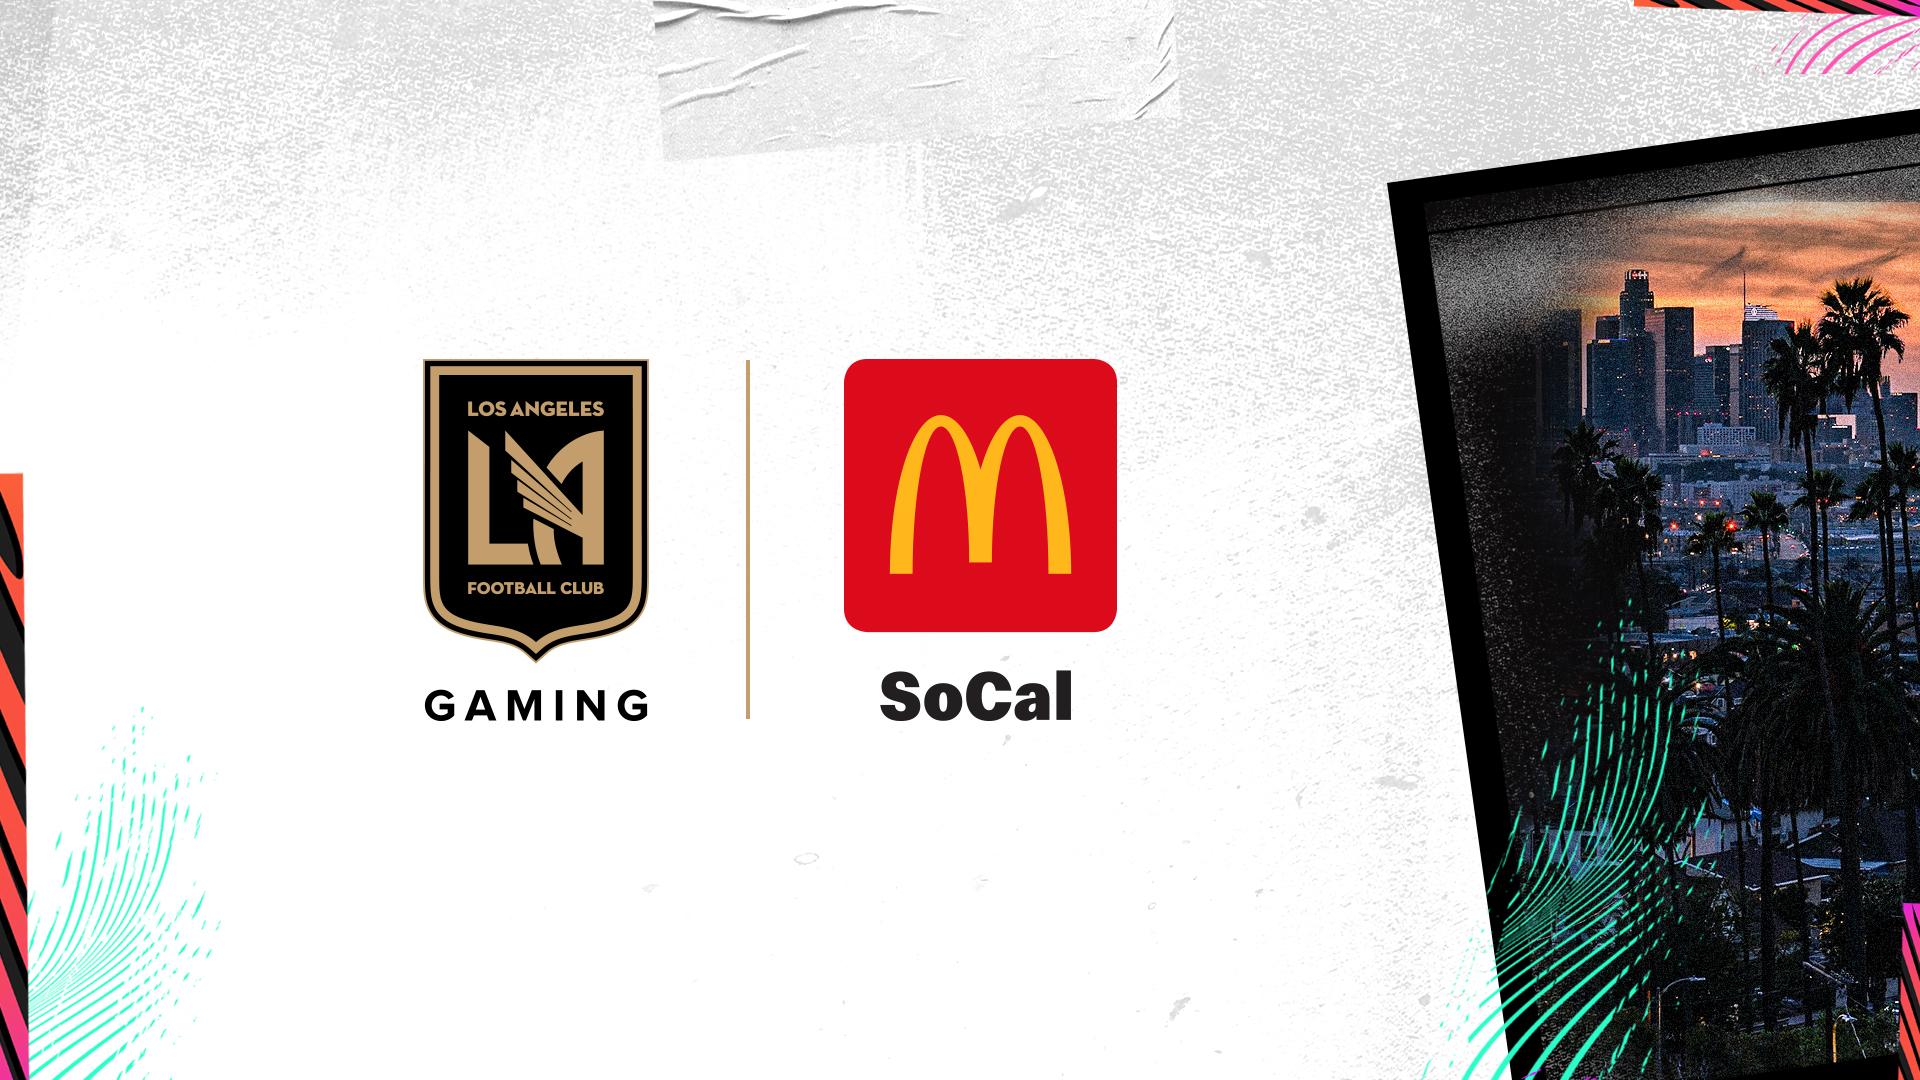 LAFC Gaming